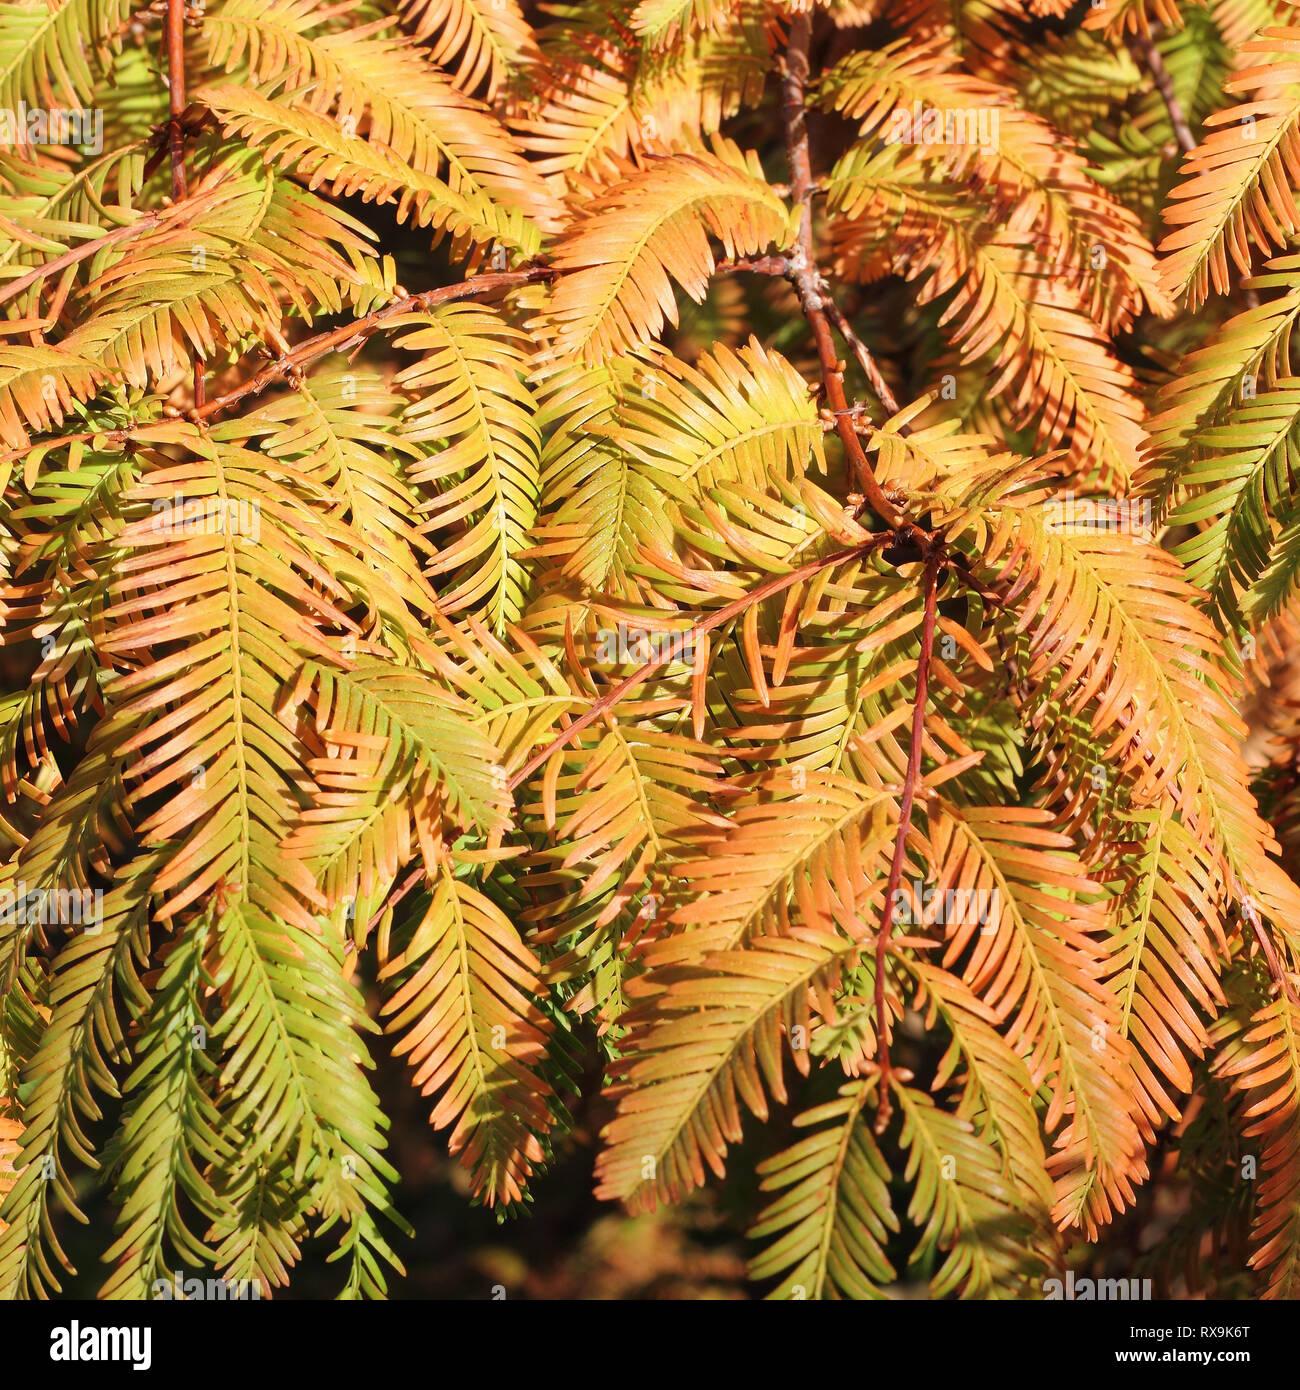 Autumnal branches of the Dawn Redwood, Metasequoia glyptostroboides Stock Photo